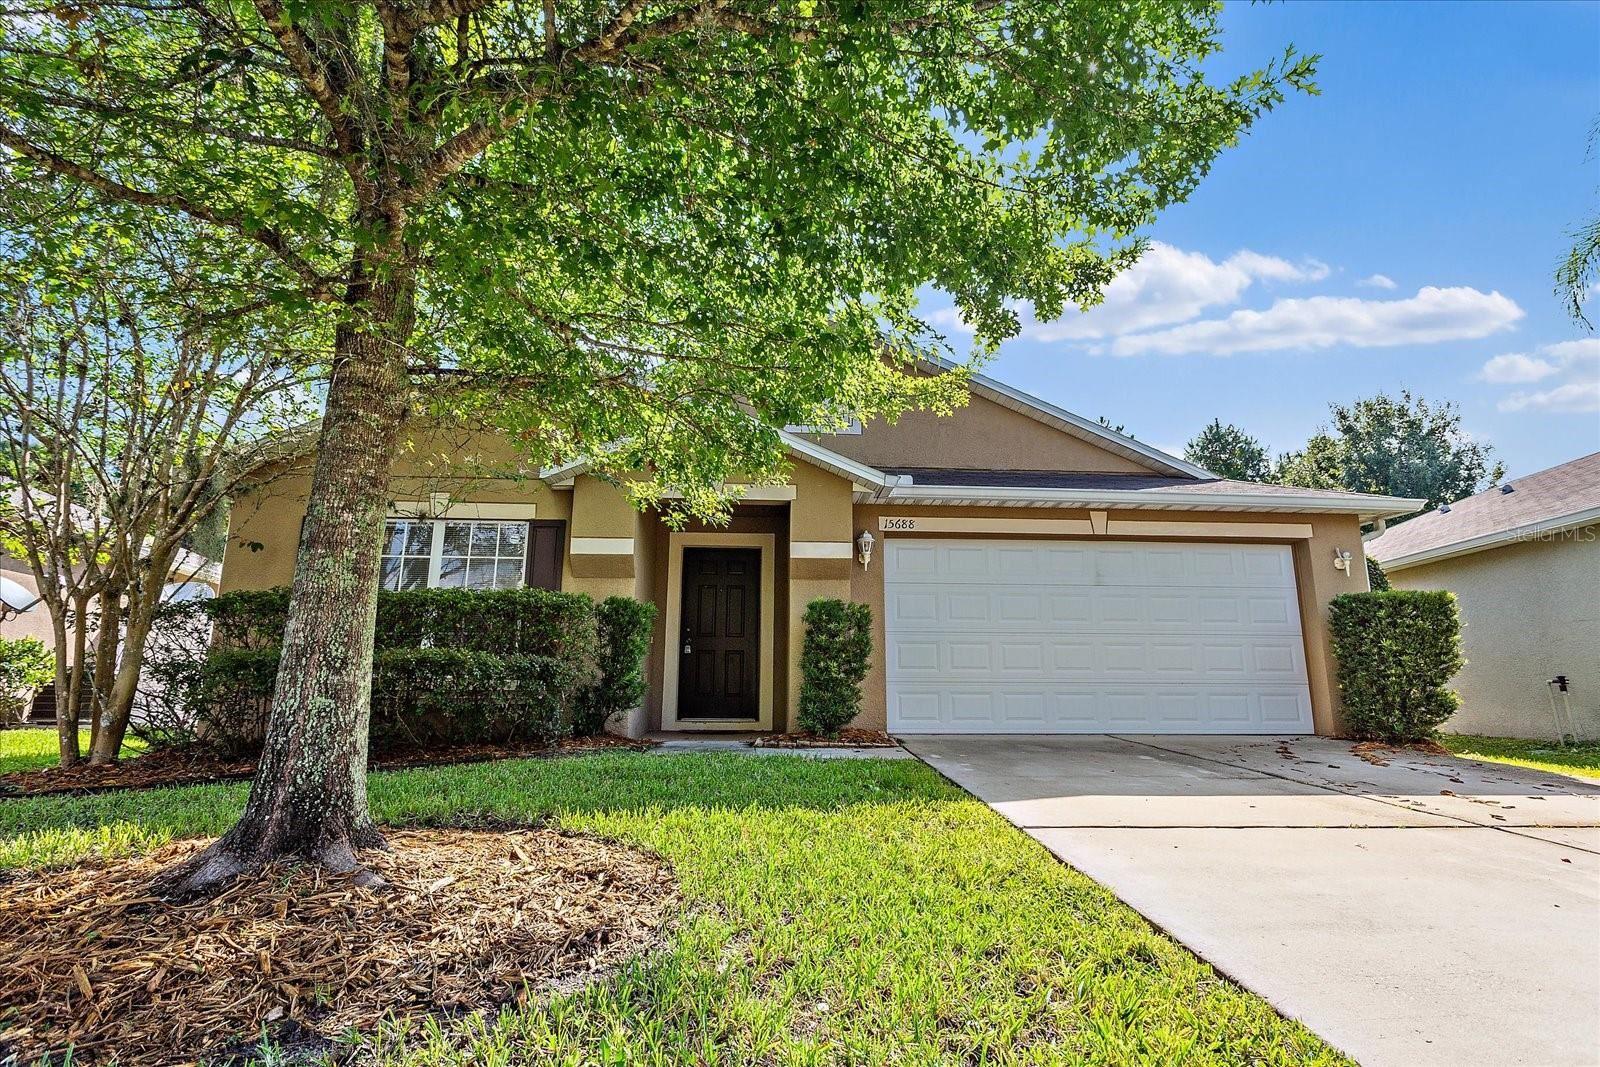 15688 GALBI DRIVE, Orlando, FL 32828 - #: O5973302